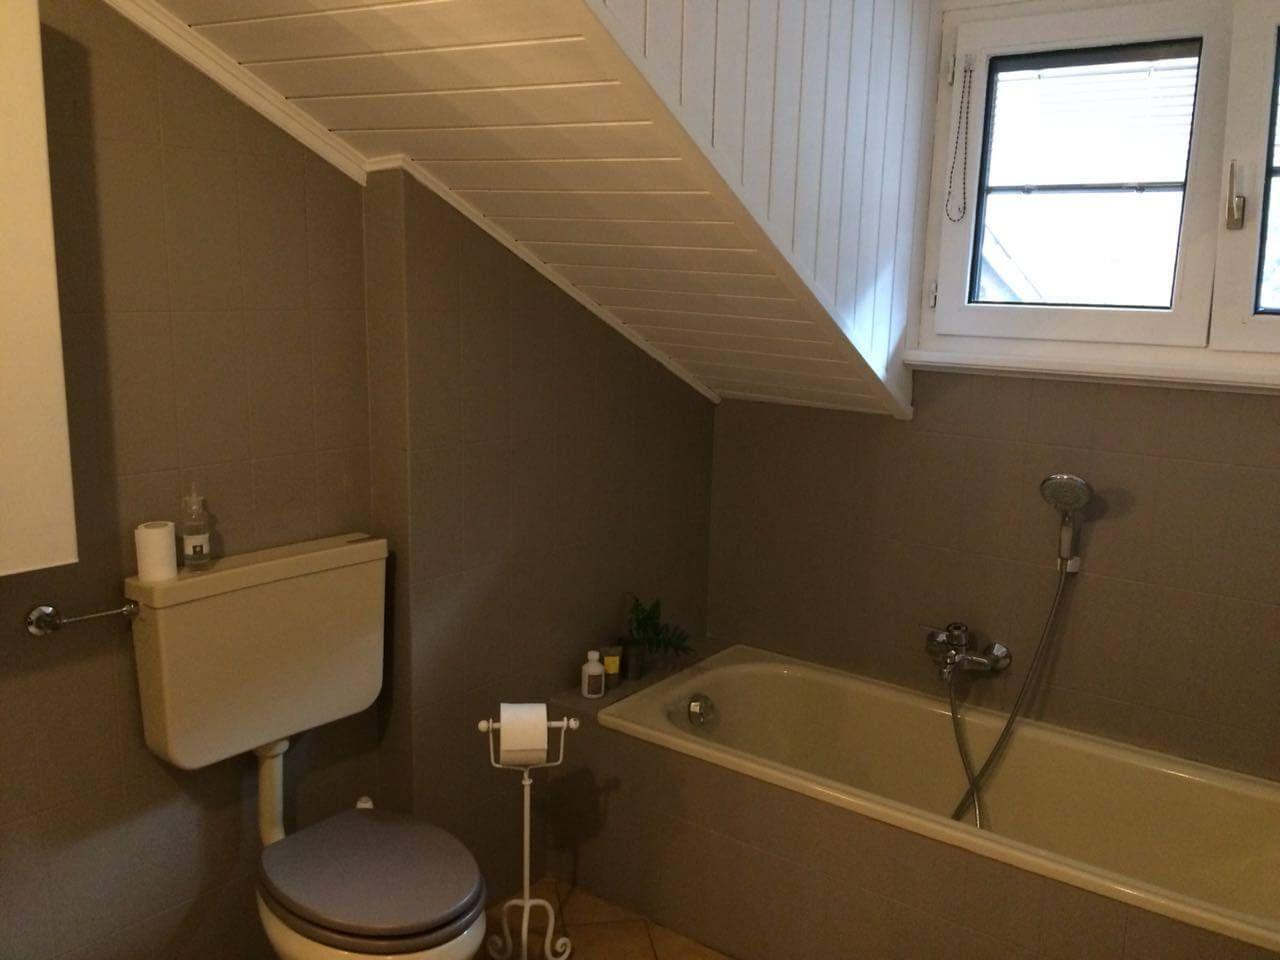 Fliesen Streichen Mit Kreidefarbe Misspompadour Diybathroomremodelsmallwalltiles Fliese In 2020 Small Bathroom Renovations Bathroom Style Diy Bathroom Remodel